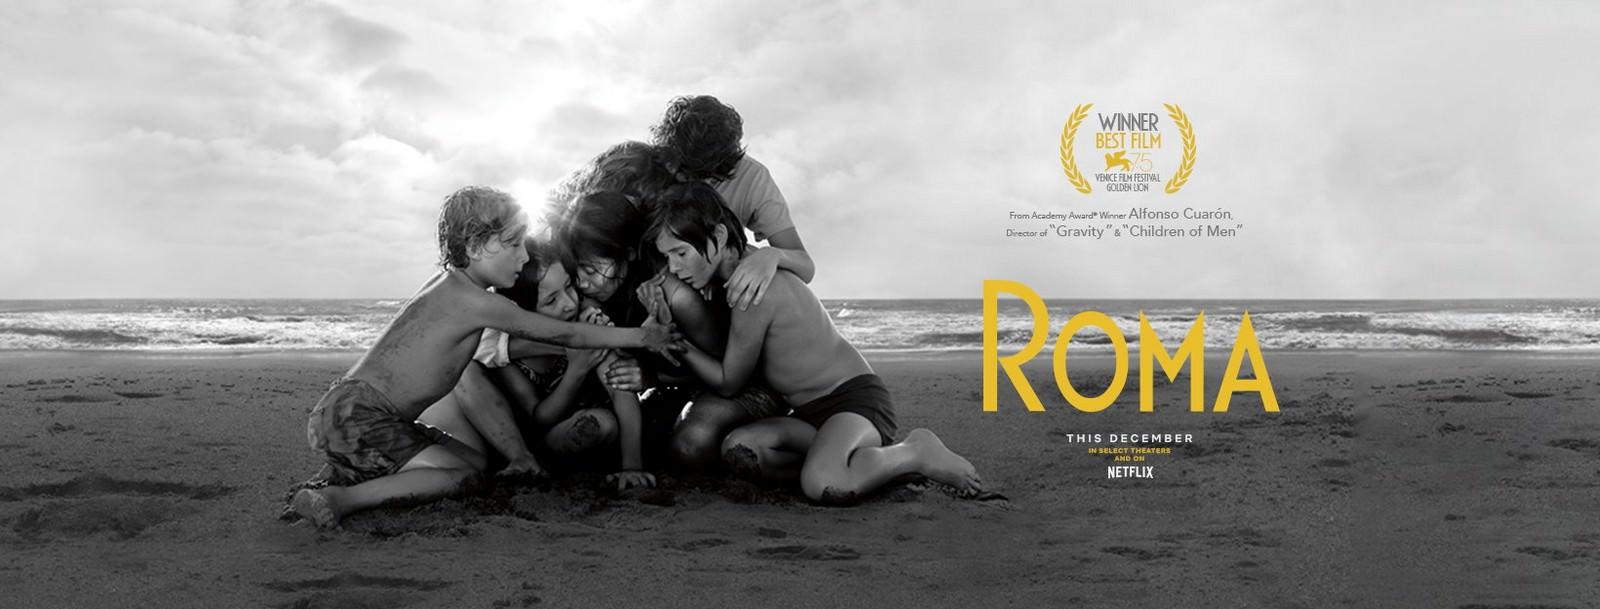 Movie, Movie, Roma(墨西哥, 2018年) / 羅馬(台灣) / 罗马(中國), 電影海報, 美國, 橫版